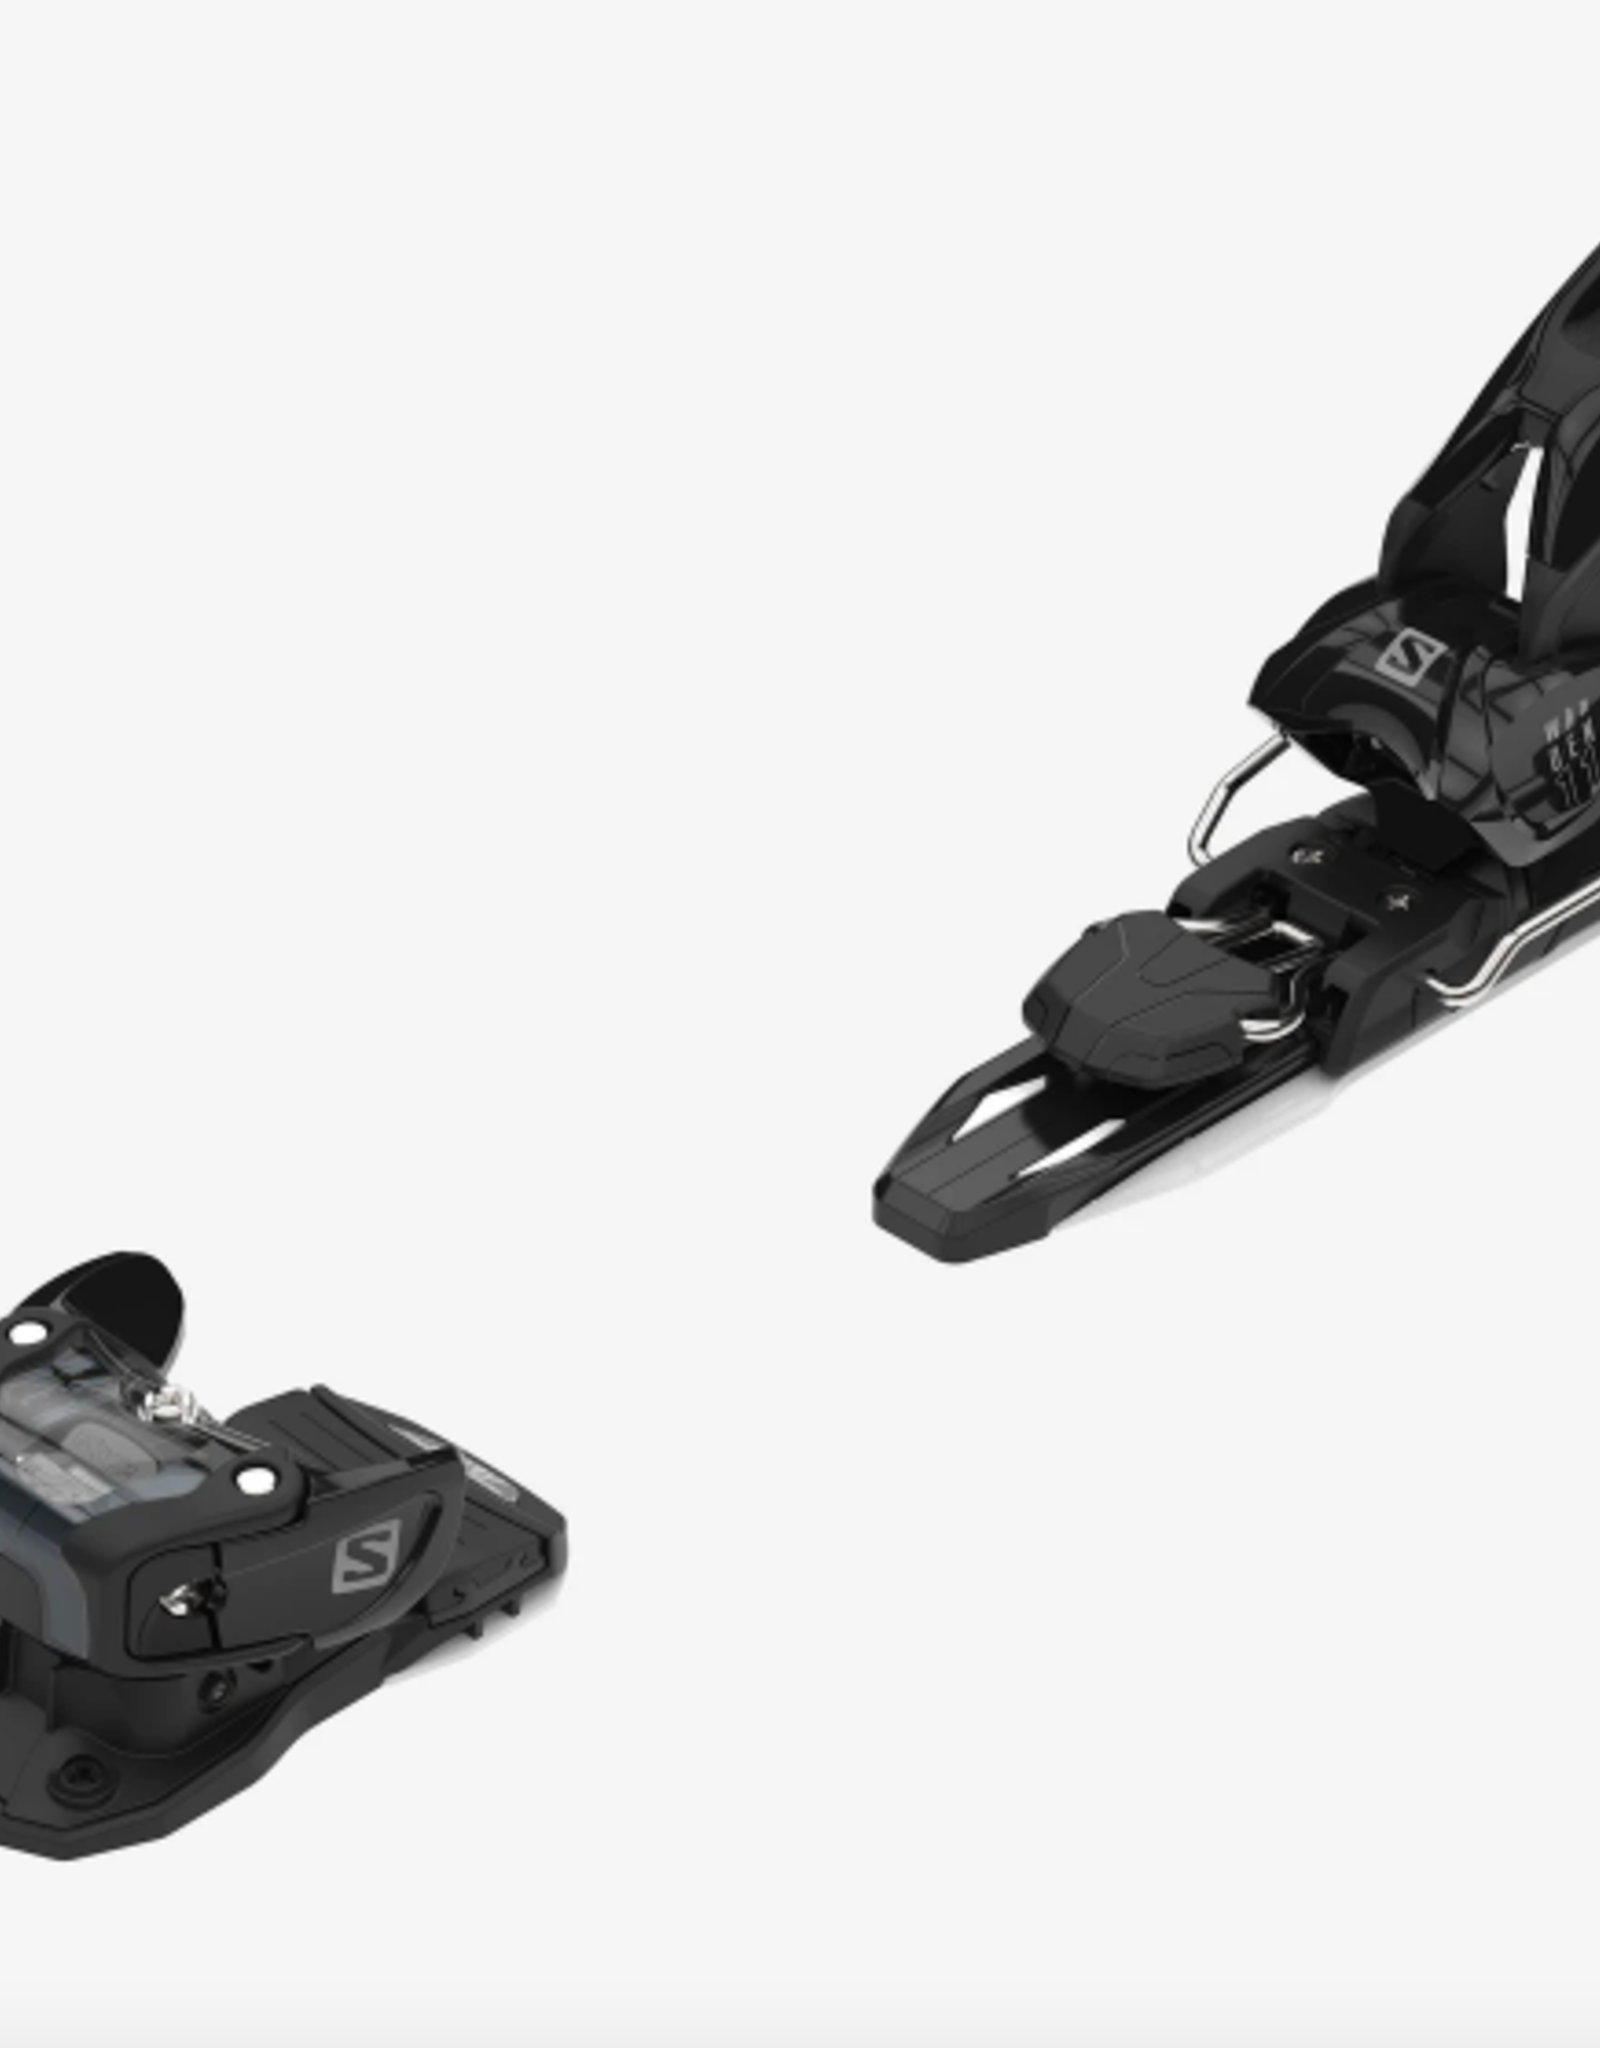 Salomon Warden MNC 11 Ski Bindings Black 2022